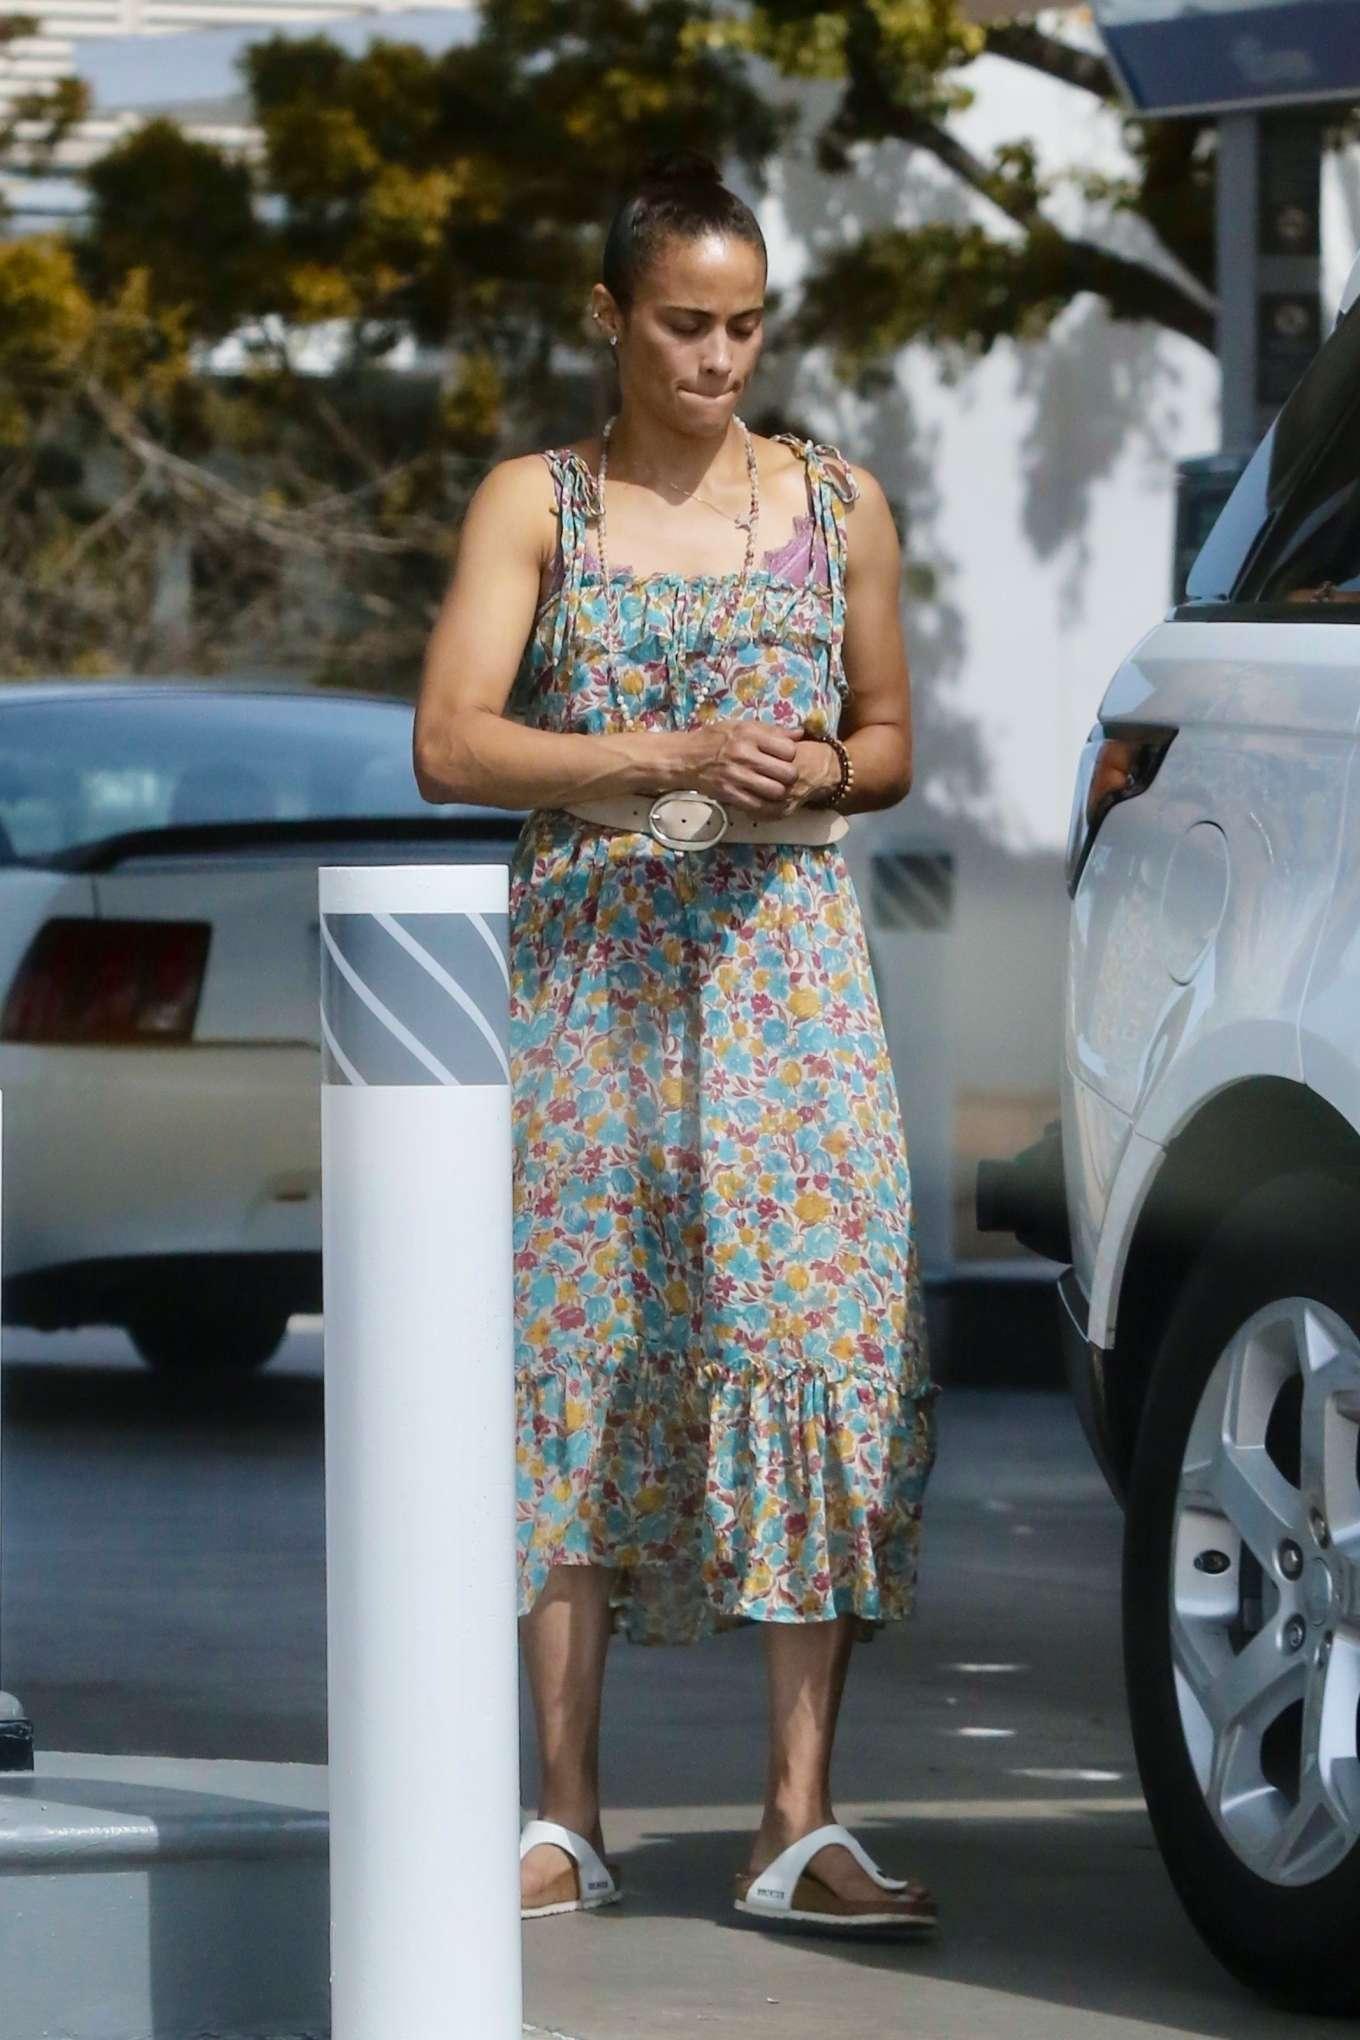 Paula Patton 2019 : Paula Patton in Floral Summer Dress-21